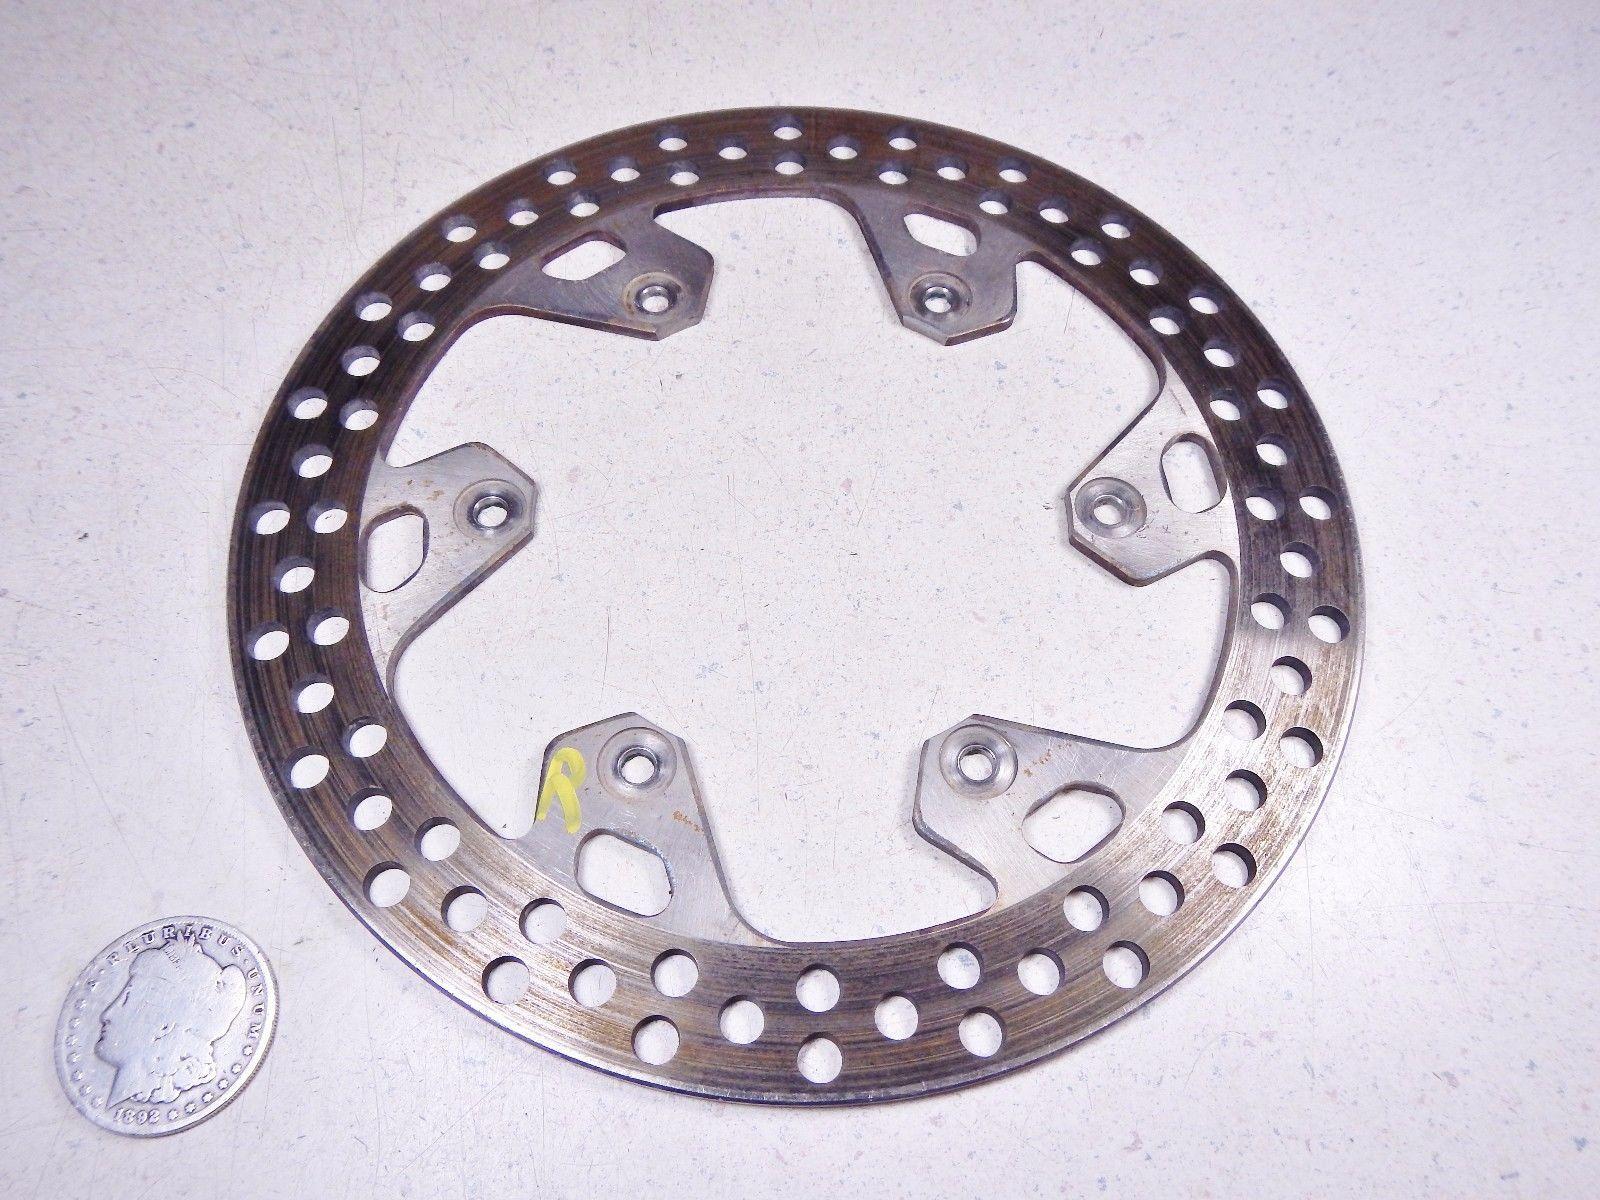 99 yamaha yz125 frein arri re disque rotor brake rotors. Black Bedroom Furniture Sets. Home Design Ideas